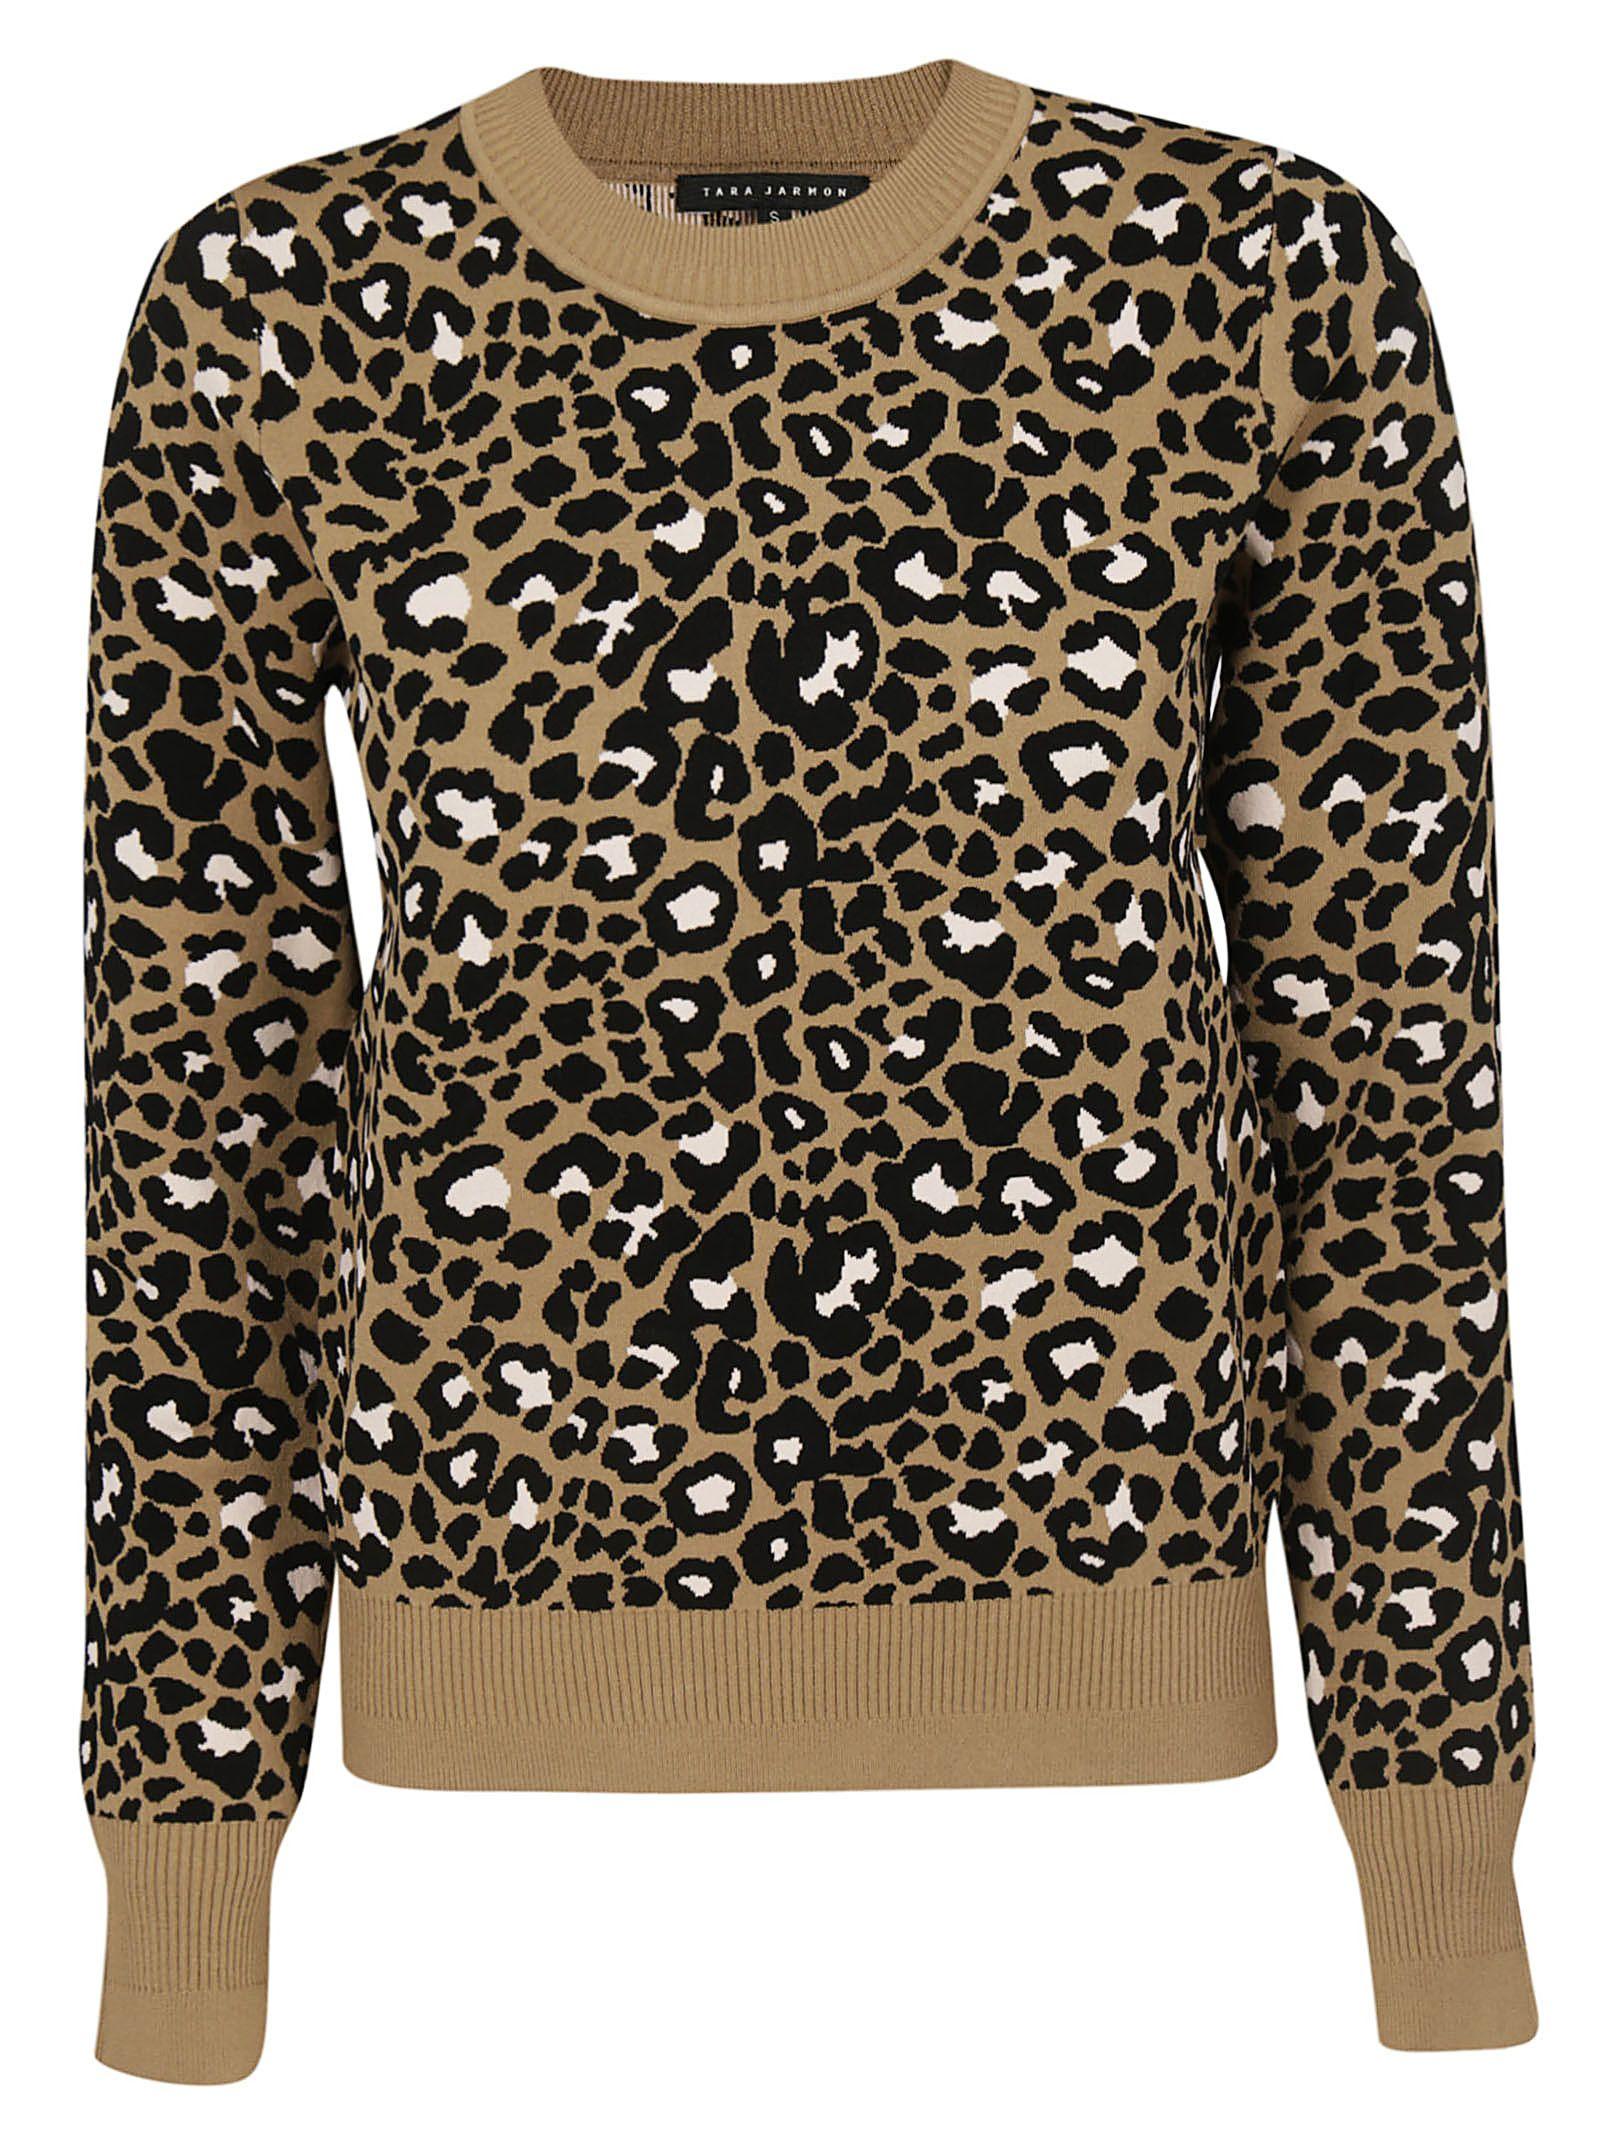 TARA JARMON Leopard Print Sweater in Camel